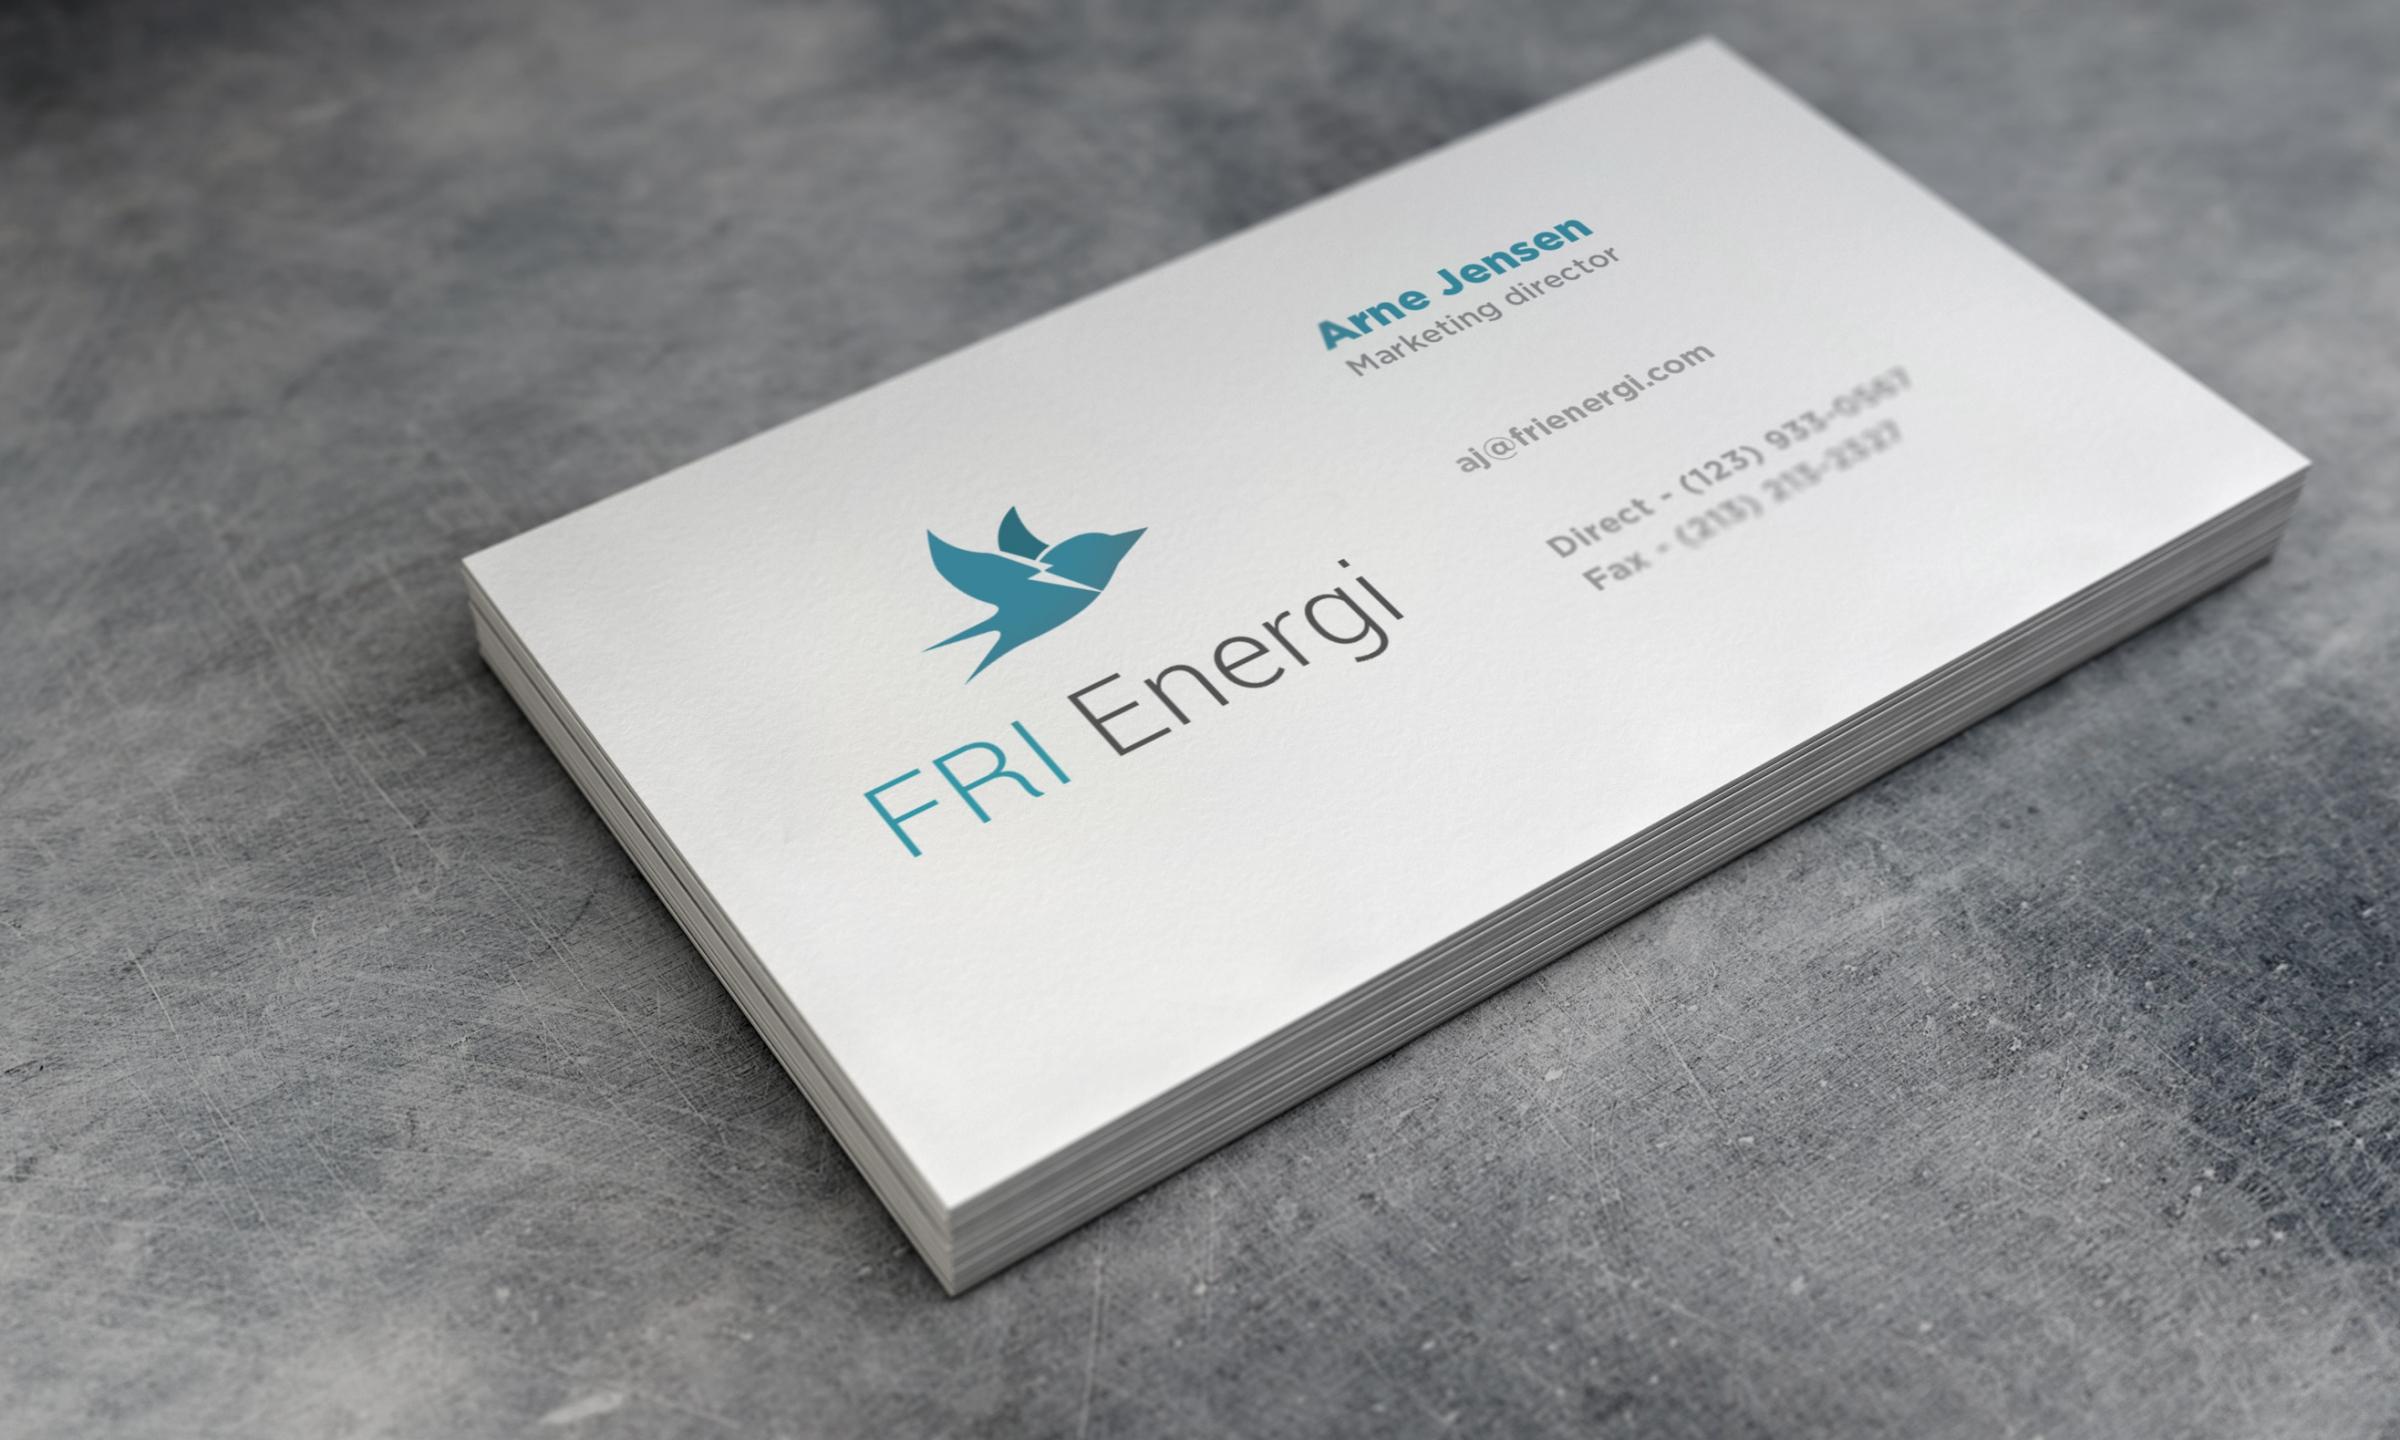 FRI energi